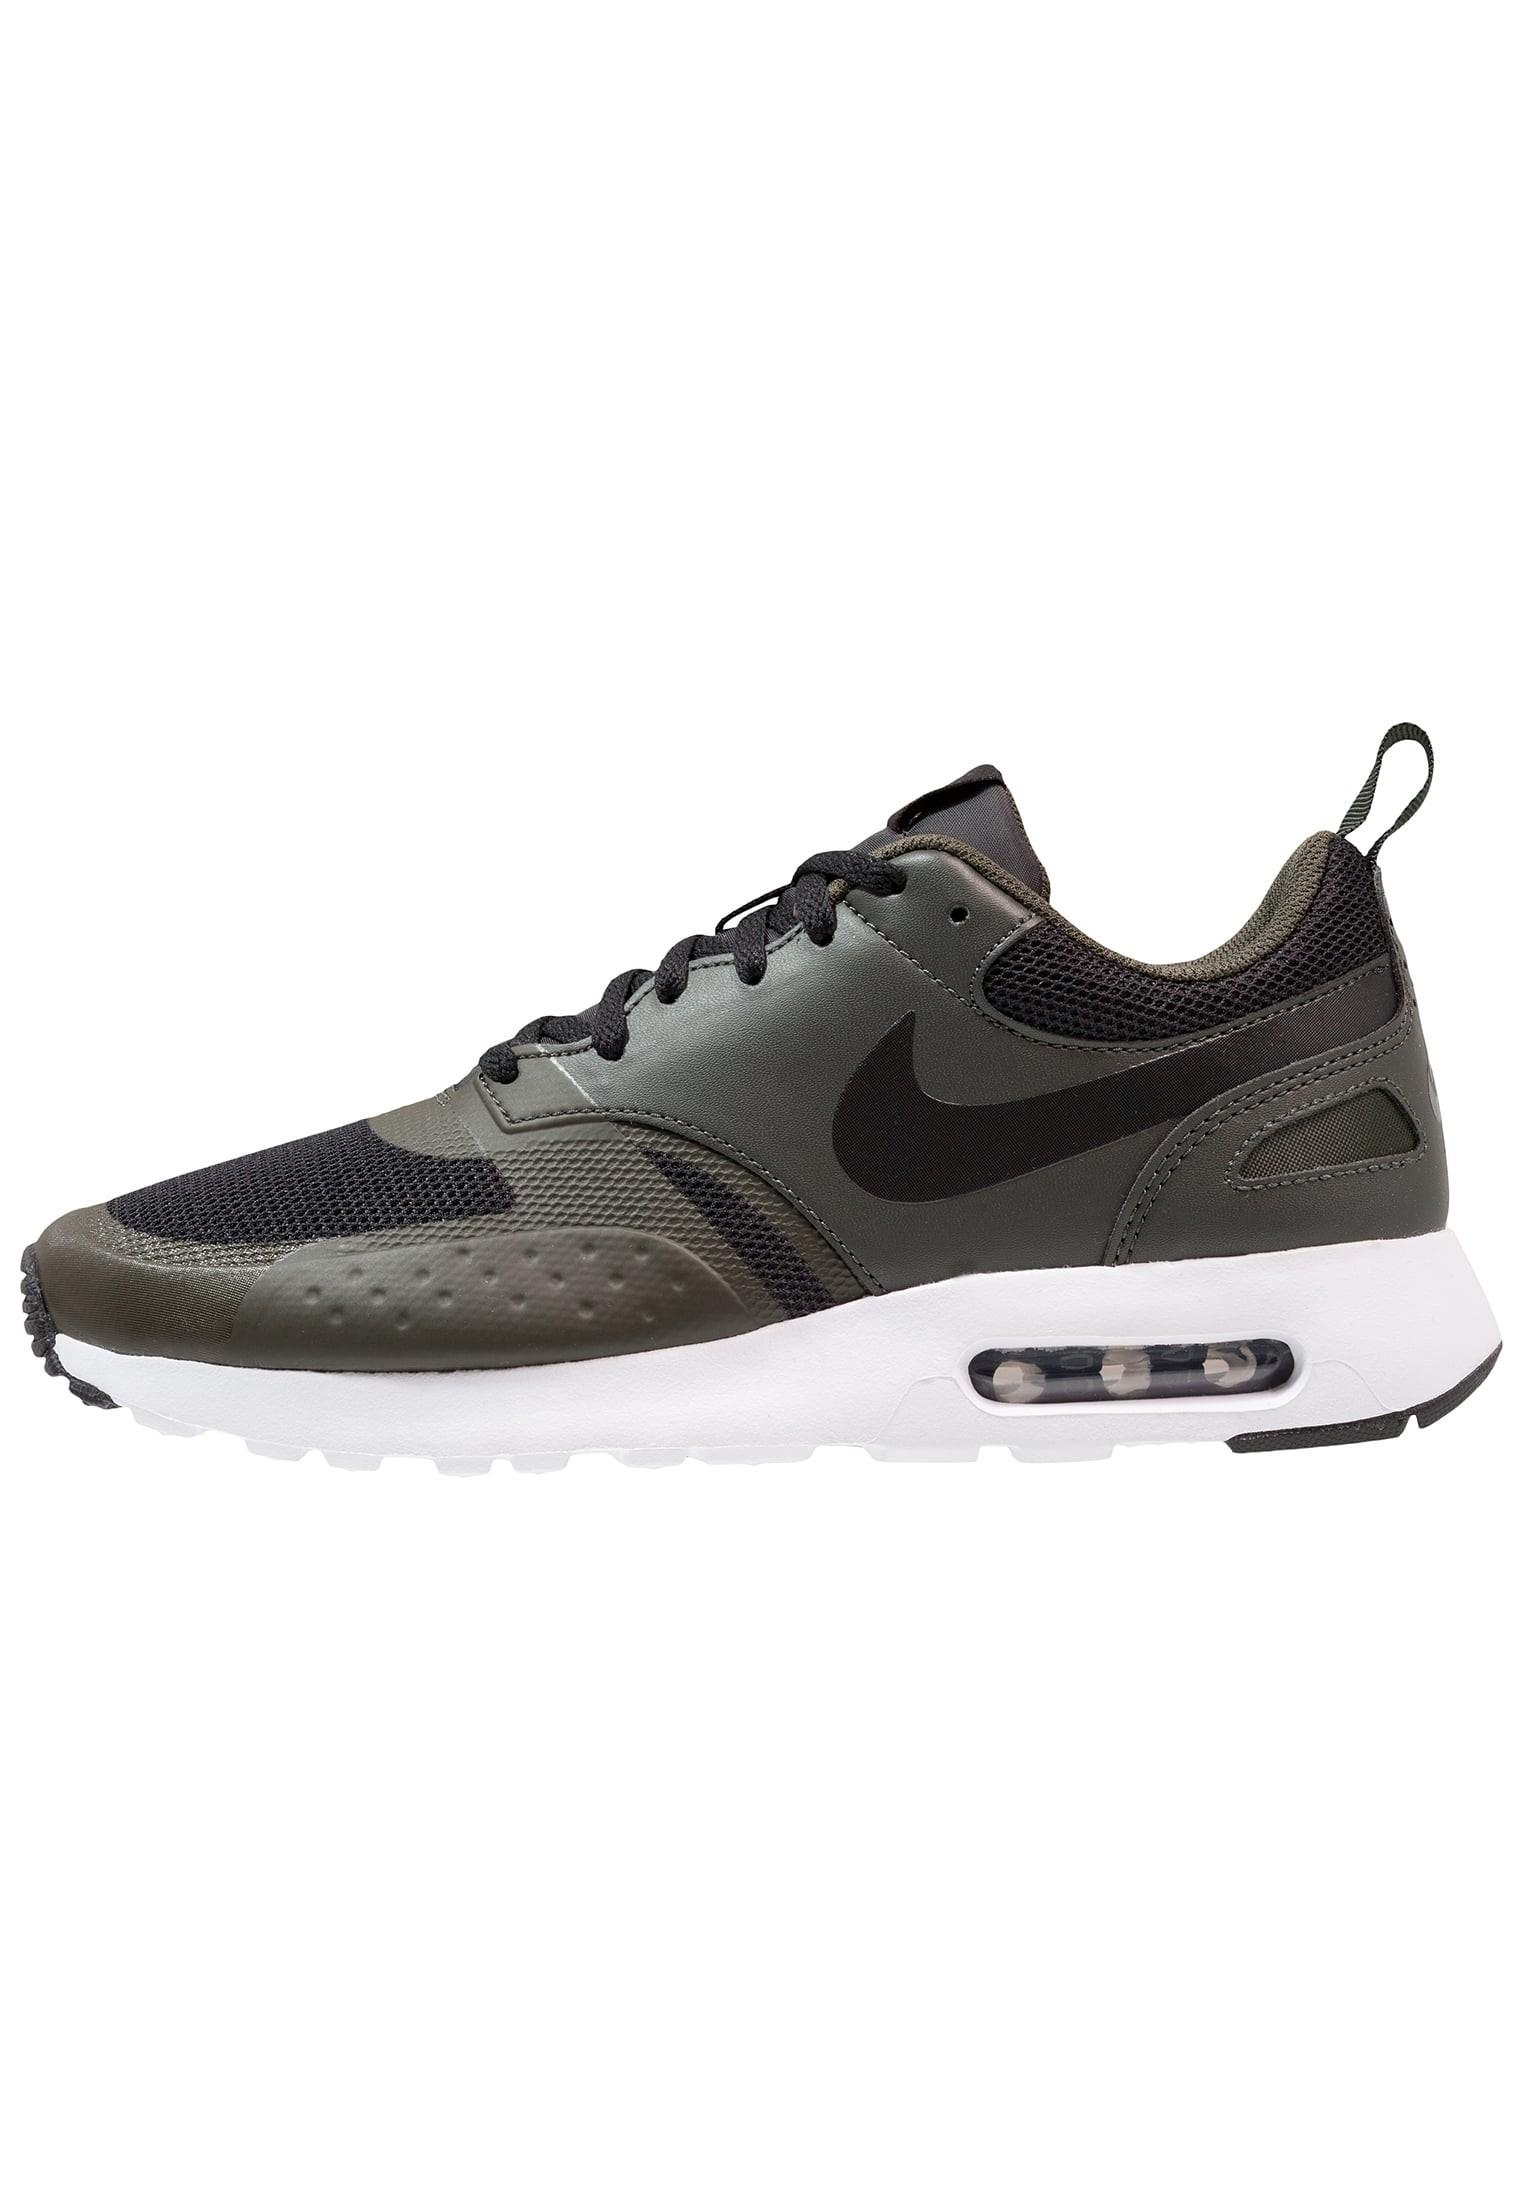 Schlussverkauf Herren Nike Air Max Vision SE Schuhe grau